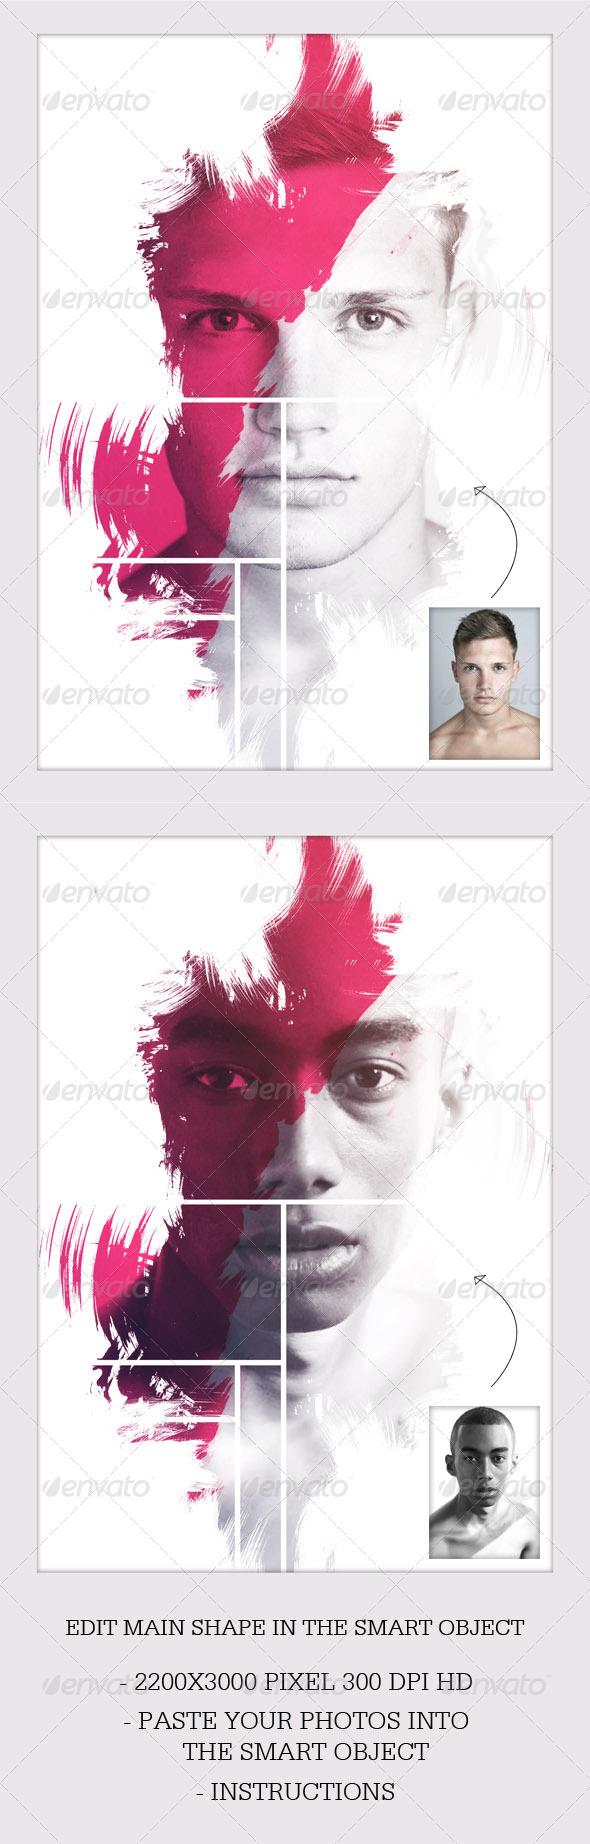 GraphicRiver Dream Photo Template V2 5601282